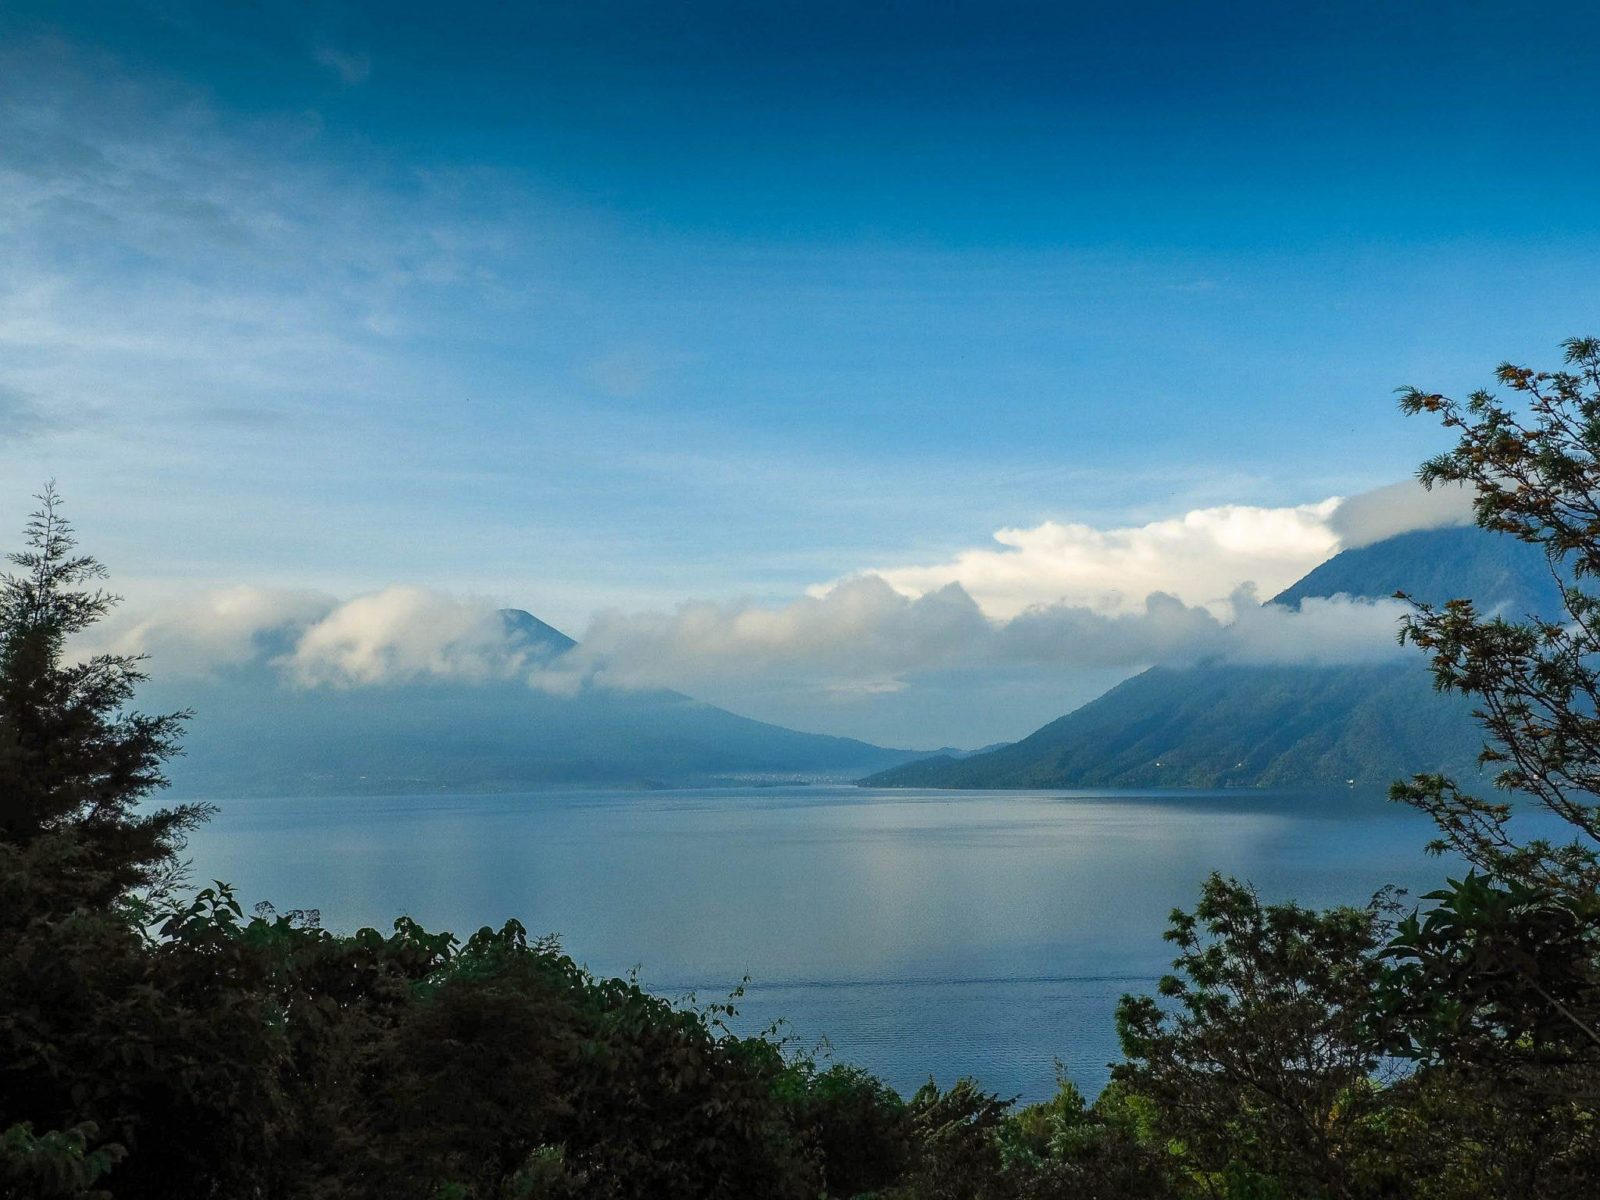 The Beginners Guide to San Marcos Lake Atitlan